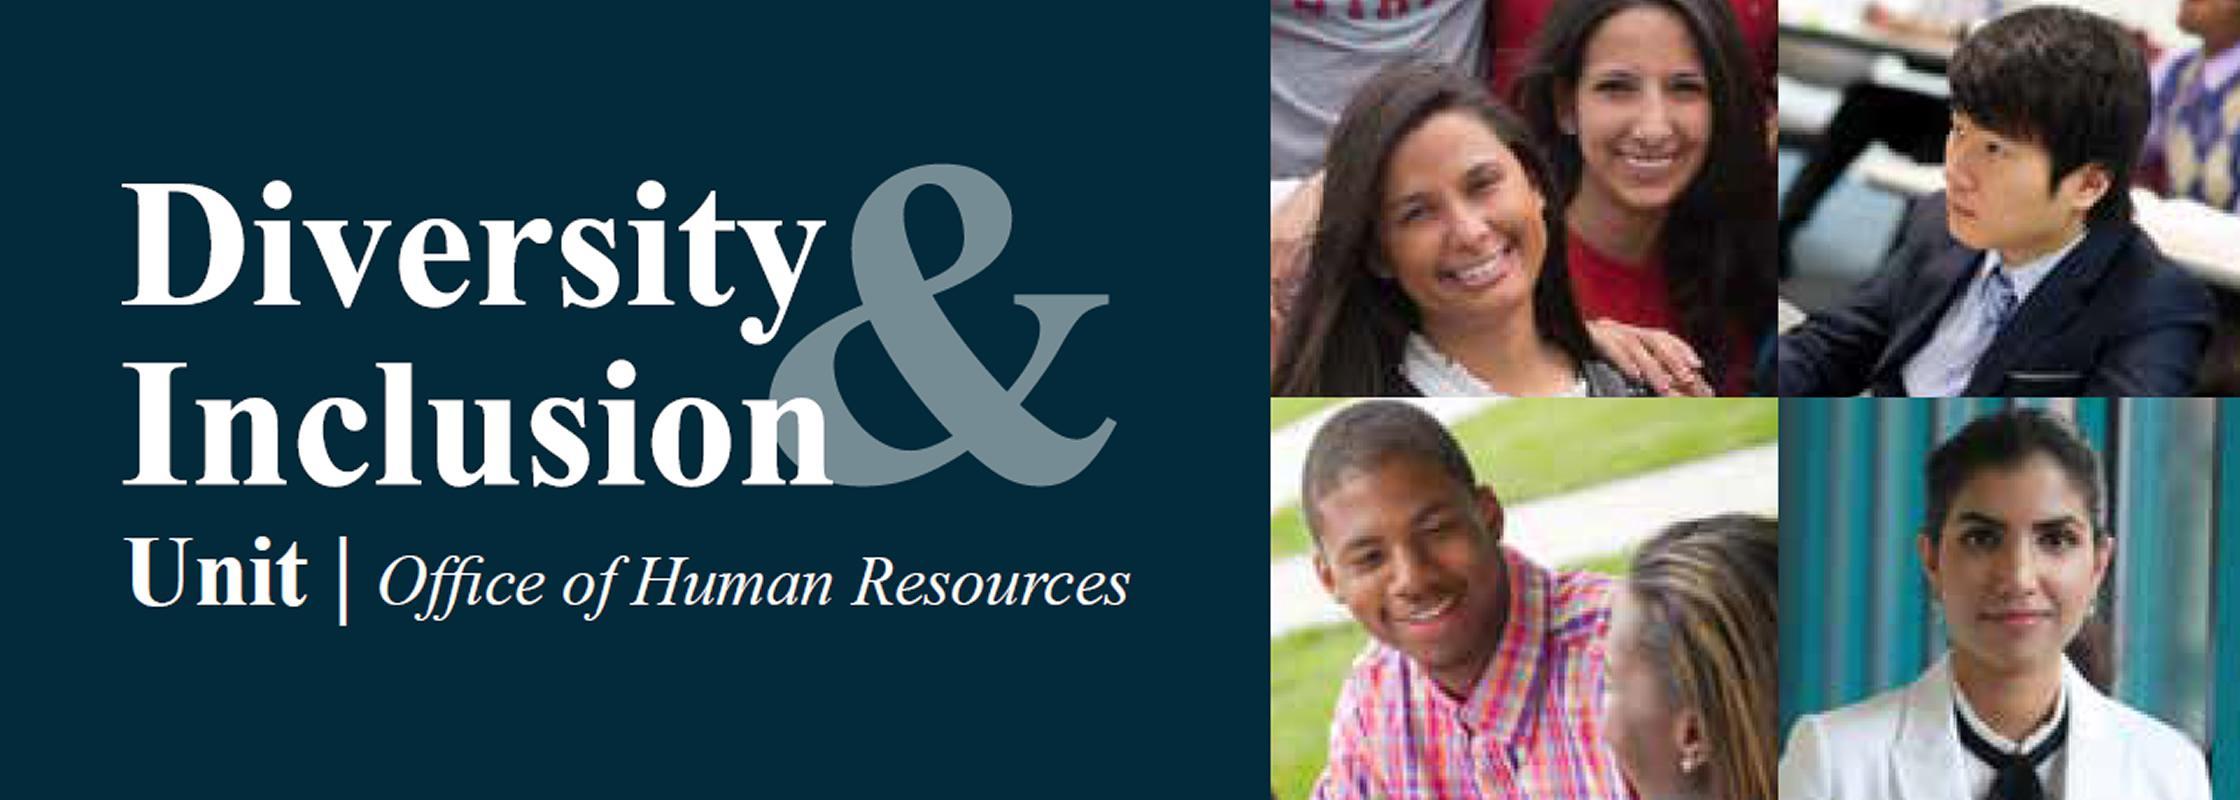 Diversity and inclusion unit